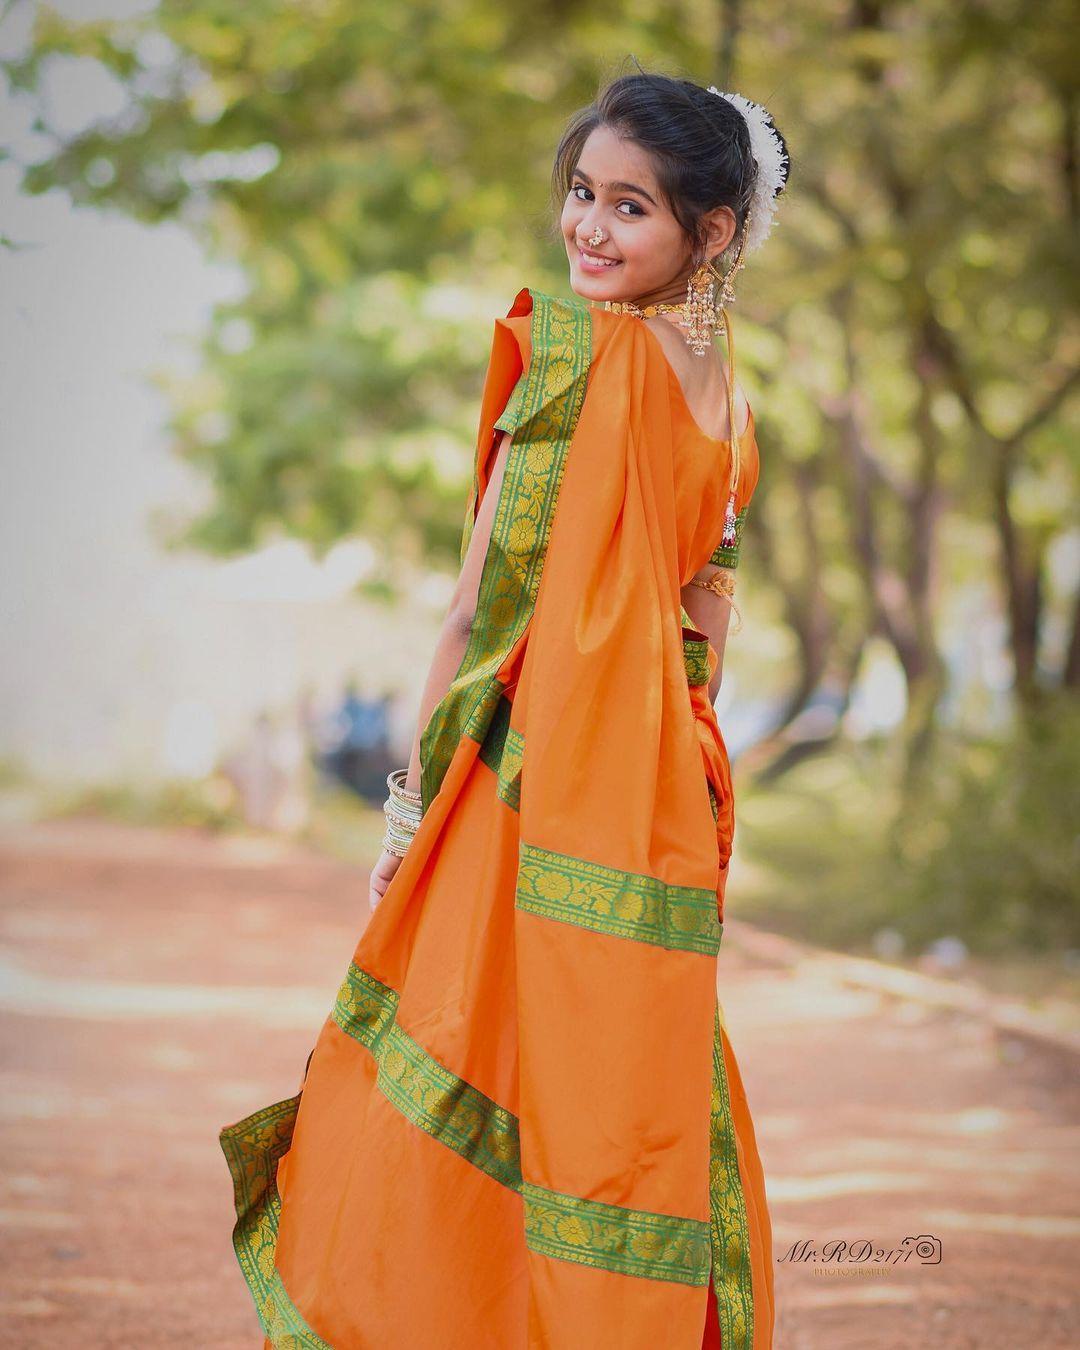 Mahi Singhvi Mishty Saree Photos Images HD Wallpapers Free Download